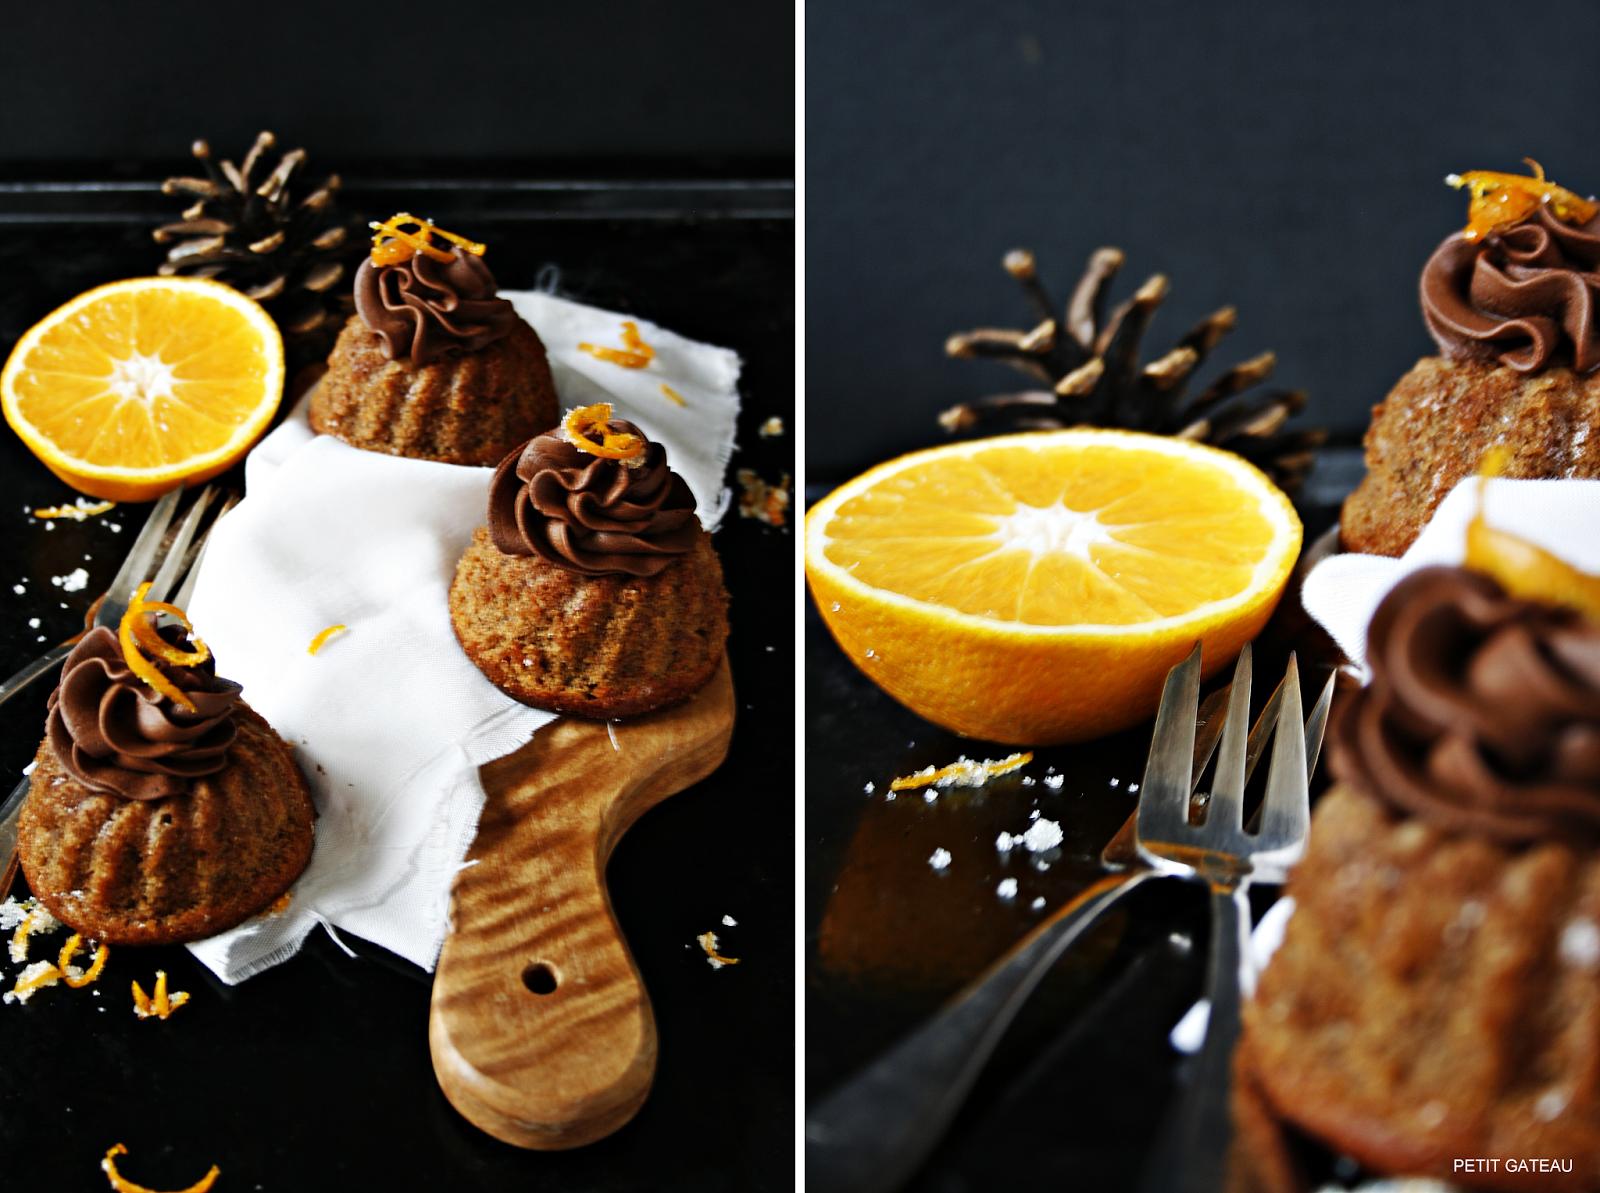 Petit Gateau: Orangen-Gugl mit Schokoladenganachetopping